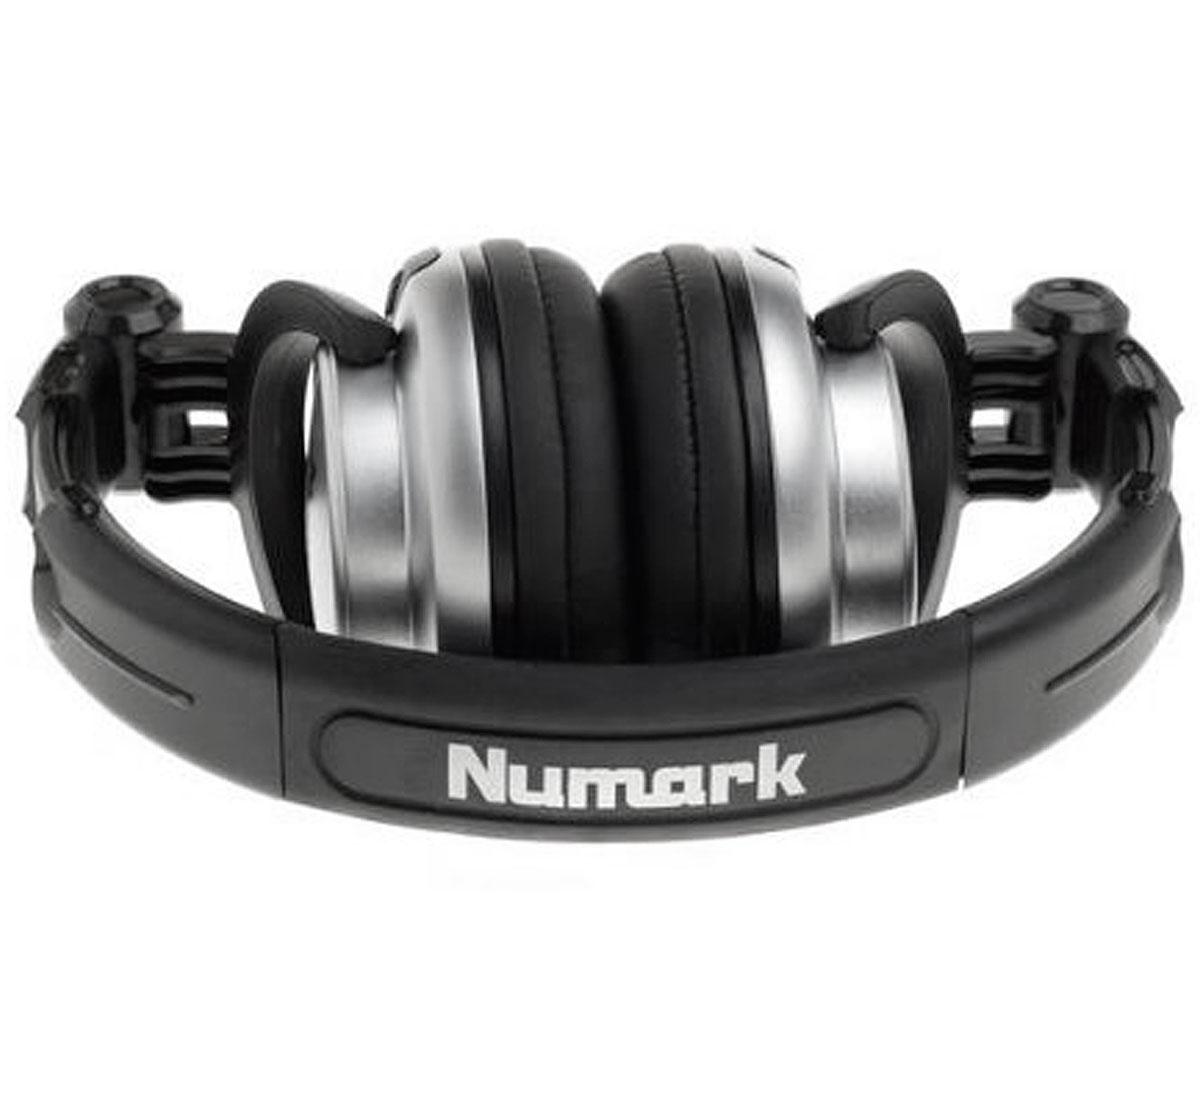 PHXUSB - Fone de Ouvido Over-ear c/ USB PHX USB - Numark